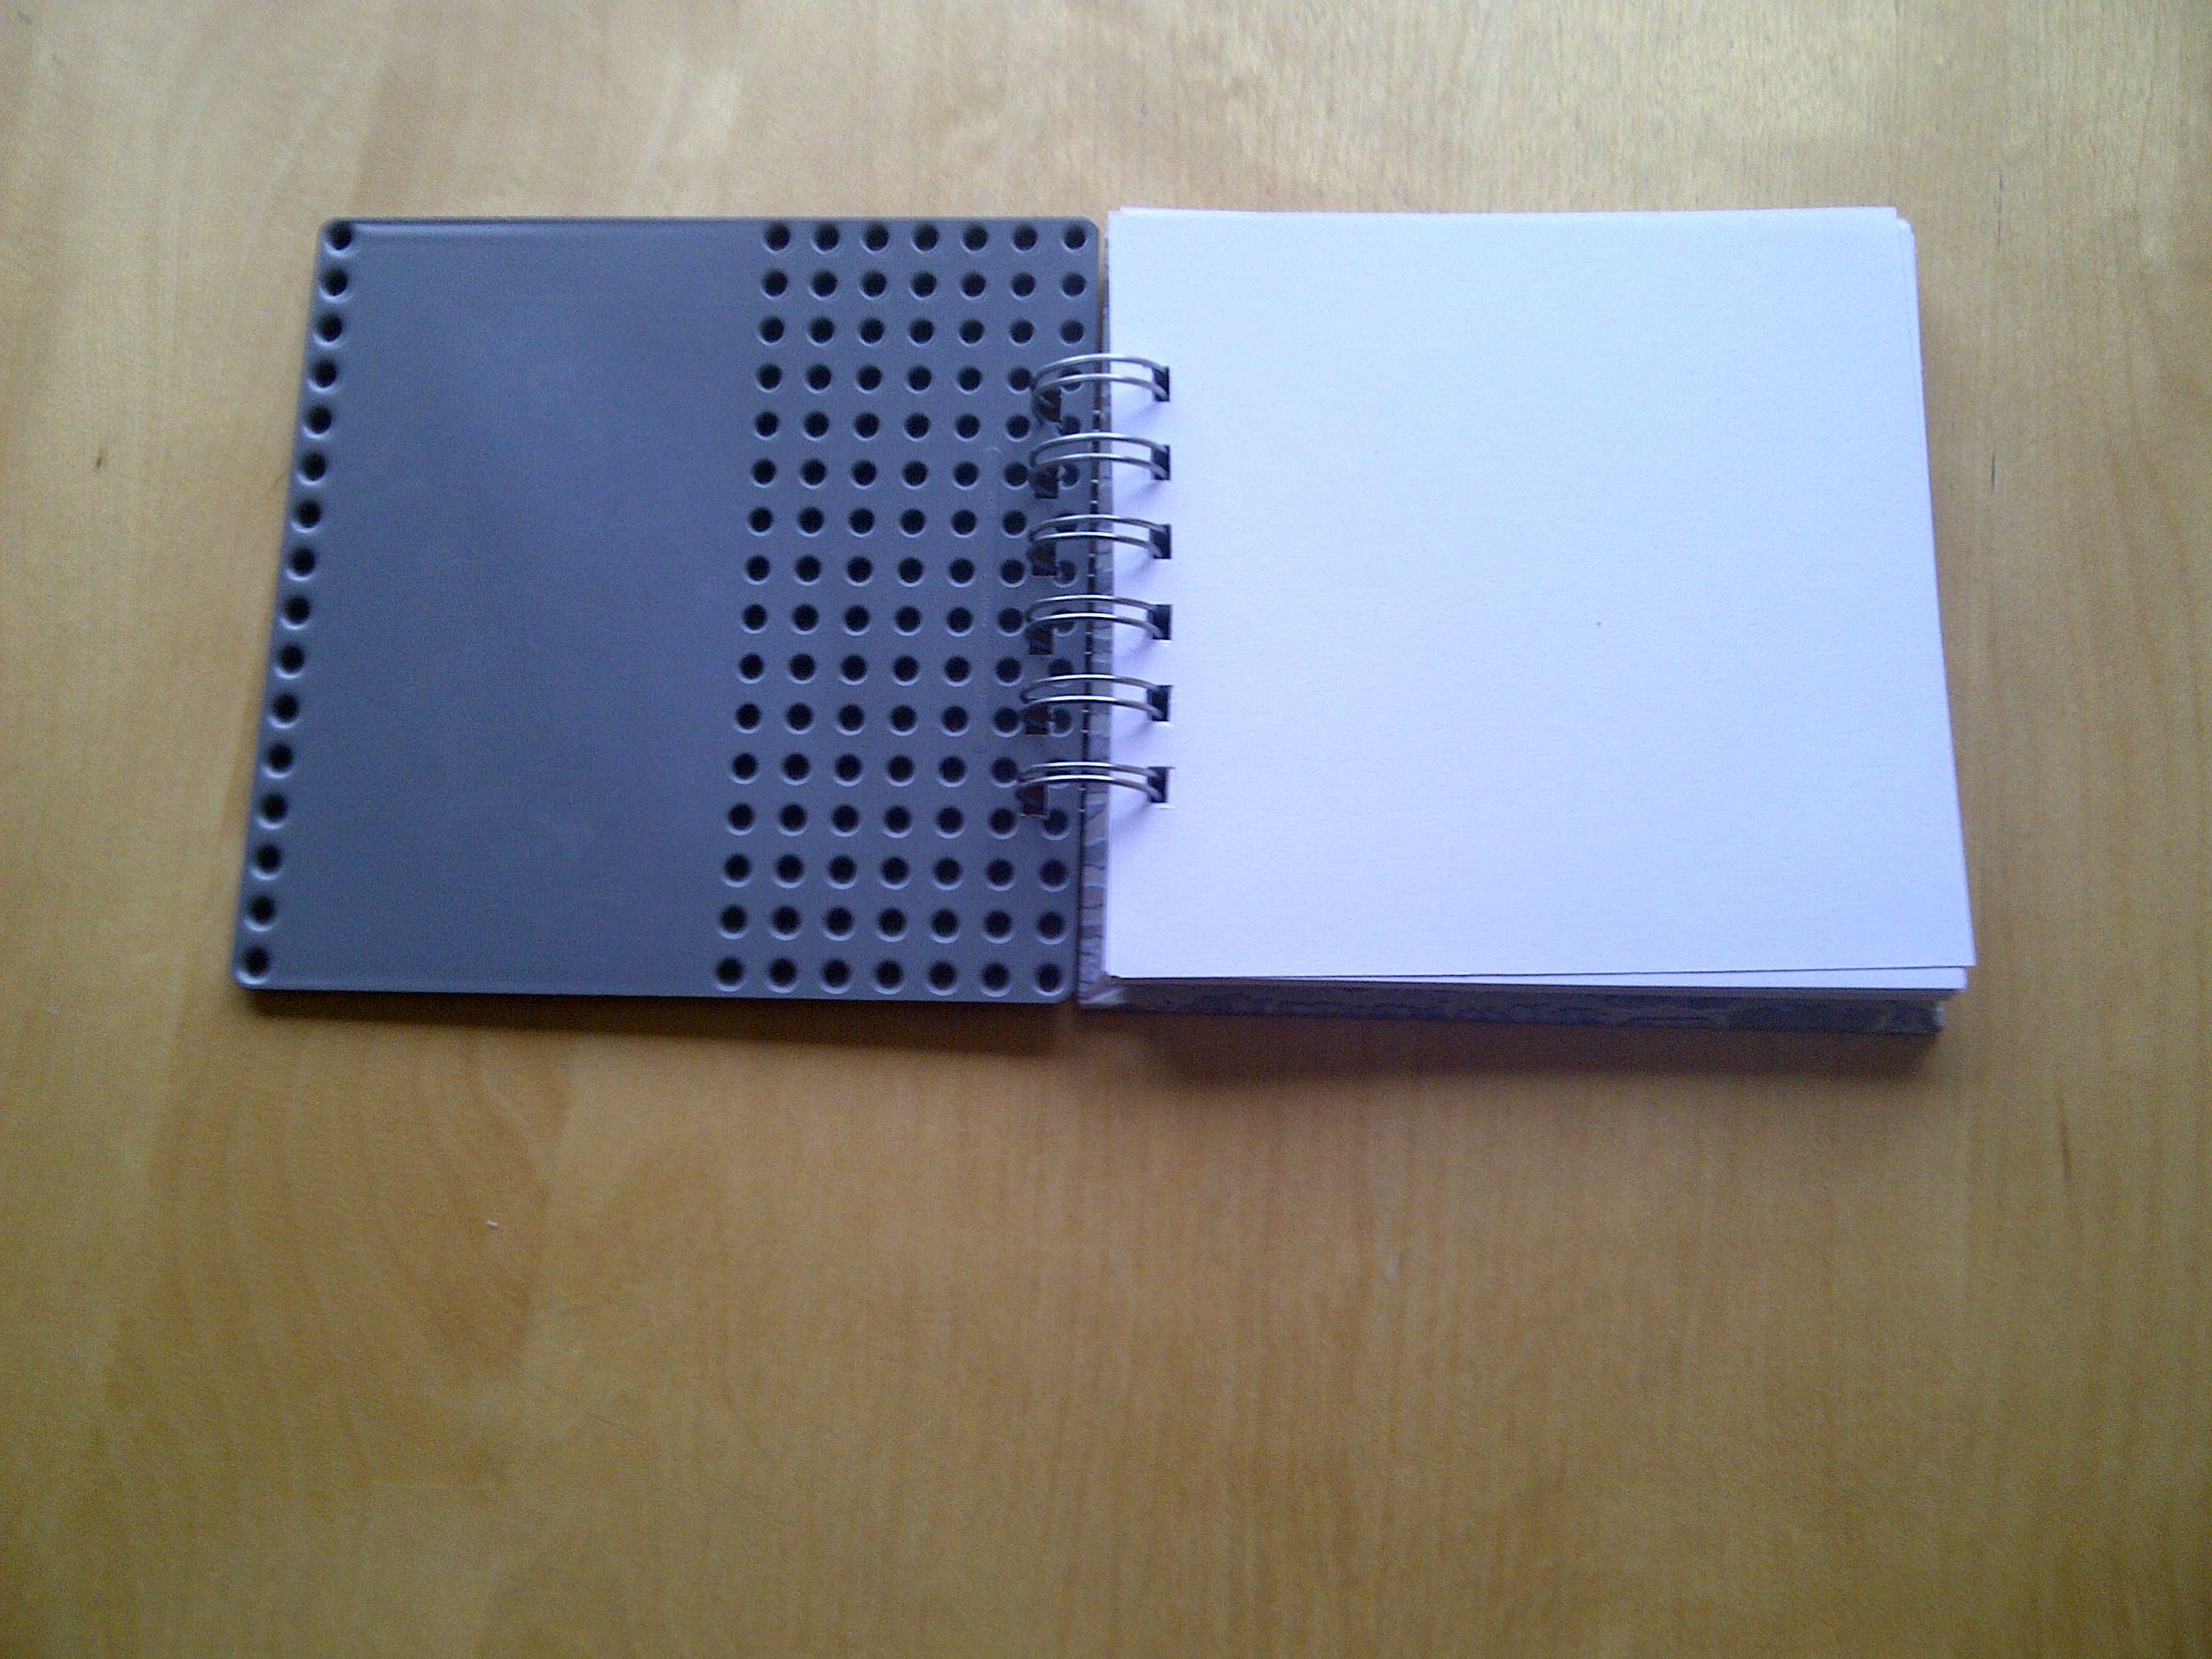 lego-notebook-1-open